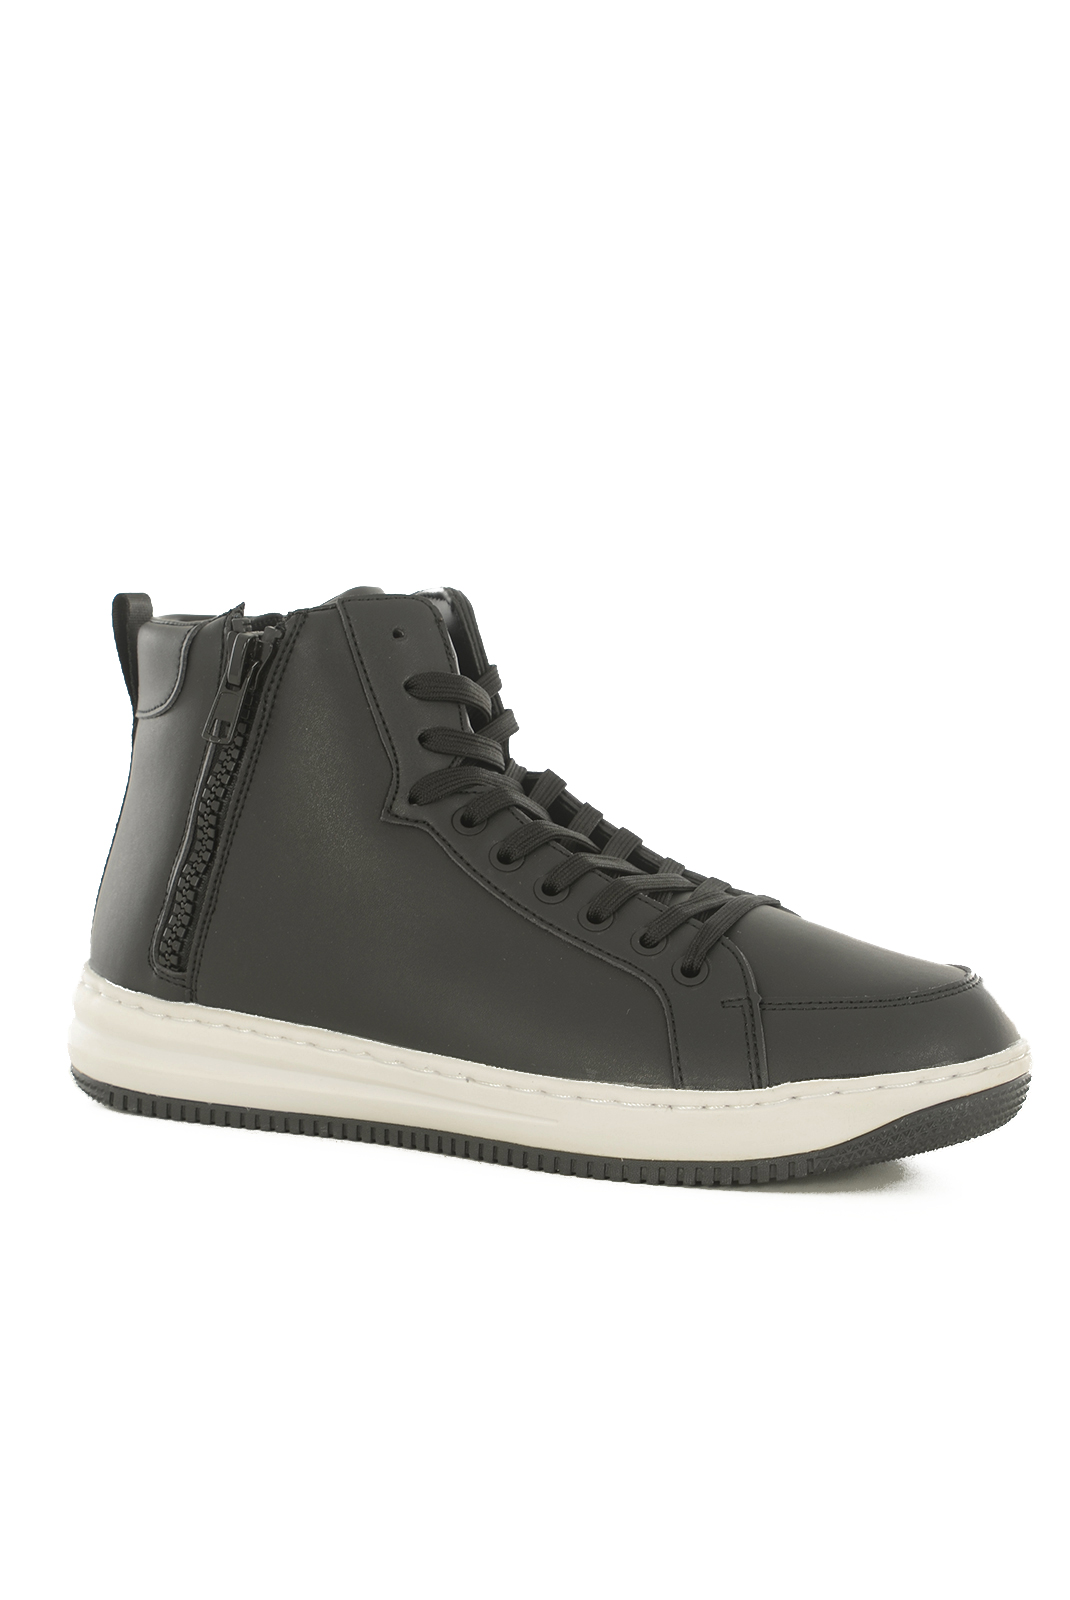 Chaussures   Emporio armani 248014 7A258 020 NOIR